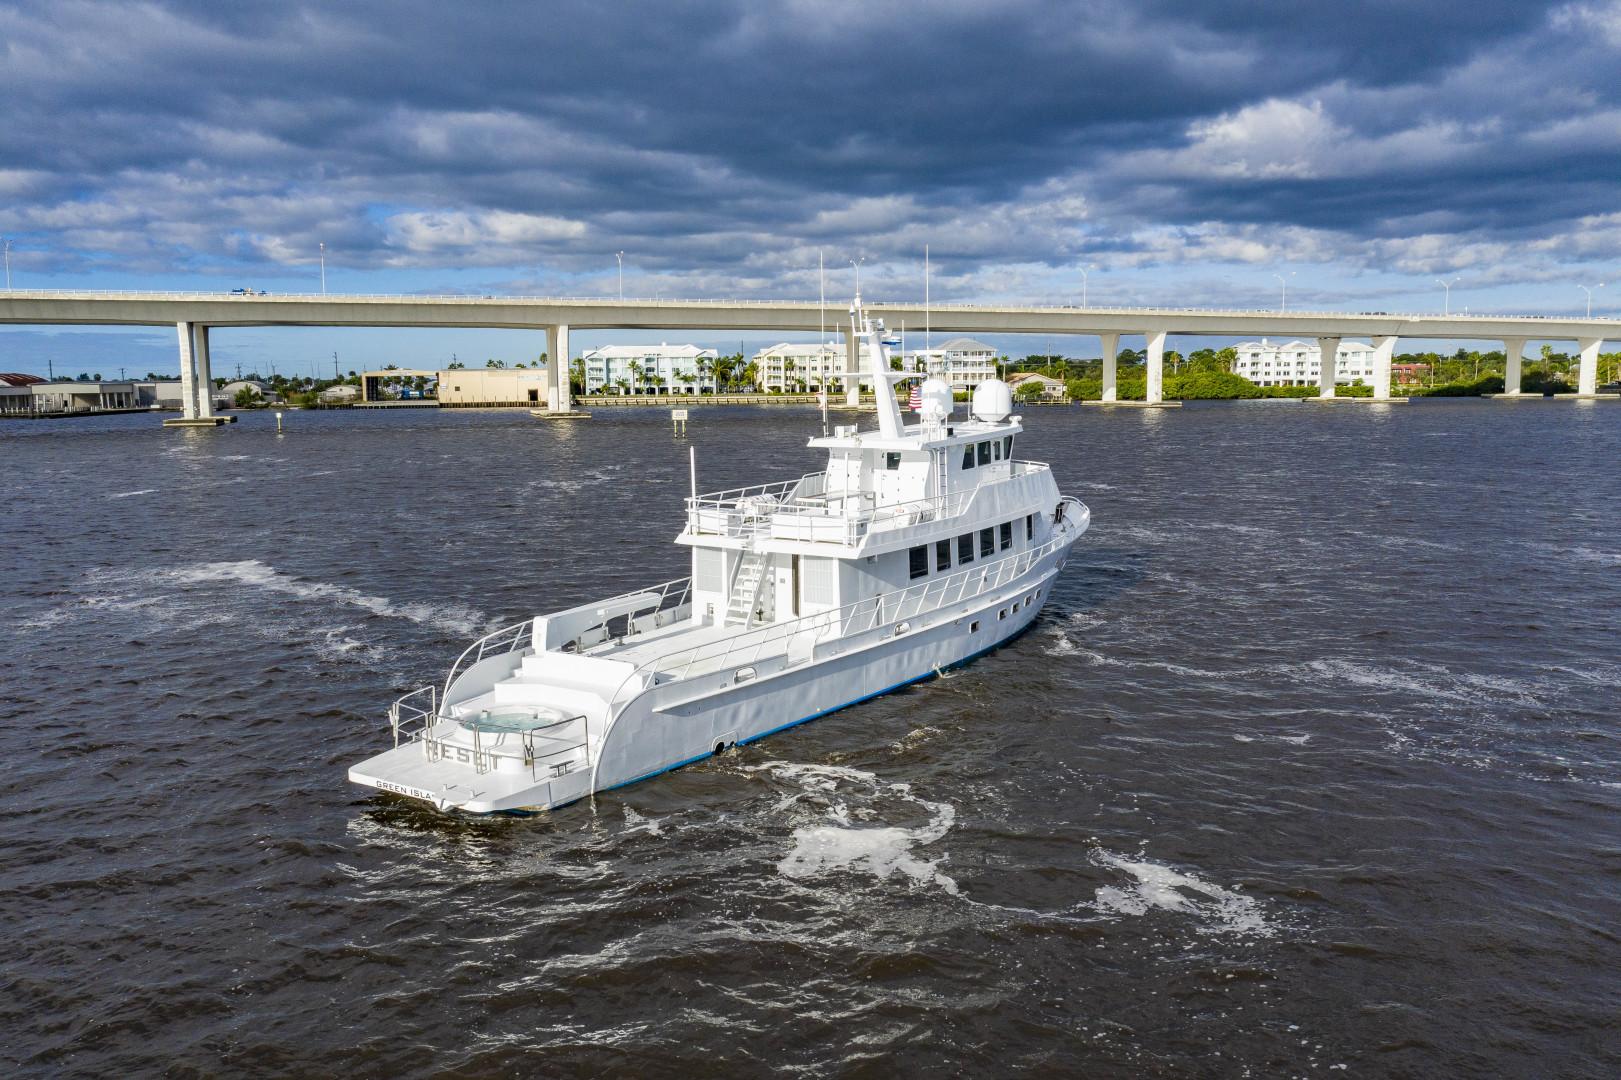 GlassTech-Expedition Yacht 2018-Reset Stuart-Florida-United States-Profile-1568538 | Thumbnail